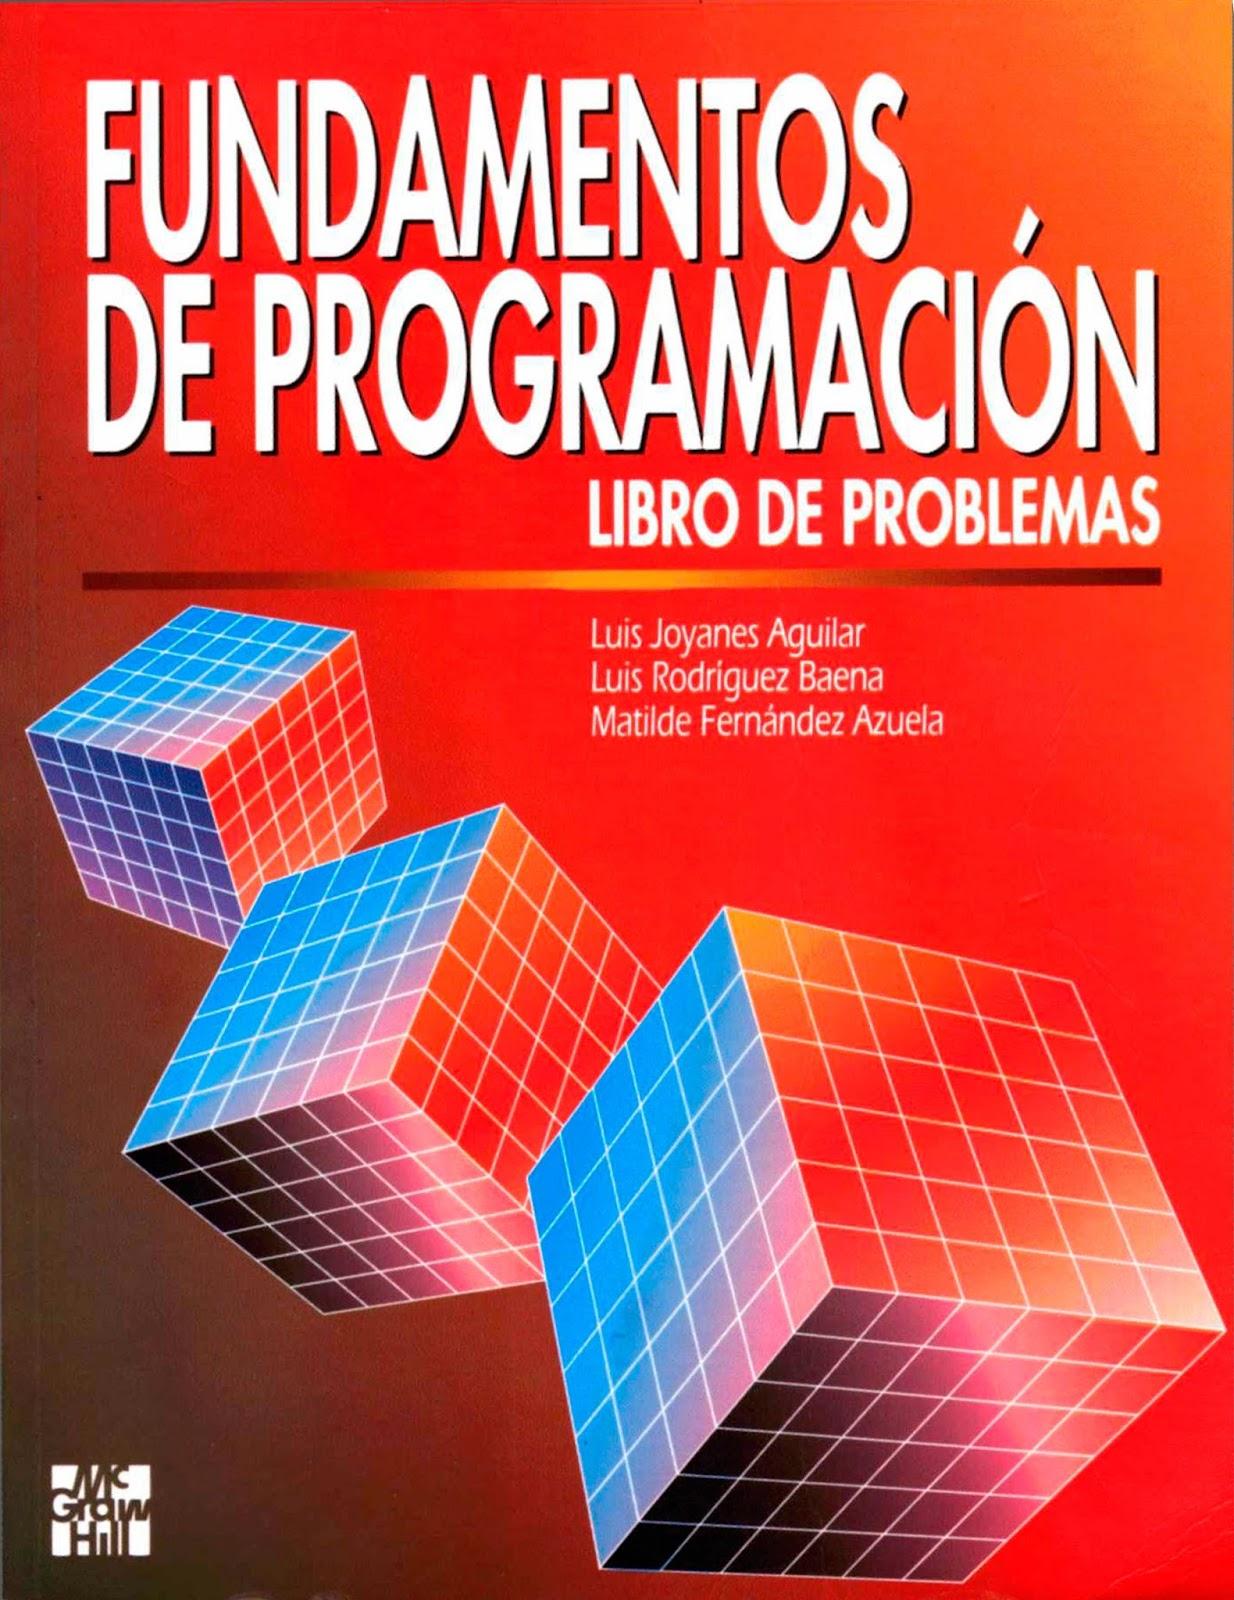 Fundamentos de programación: Libro de problemas – Luis Joyanes Aguilar